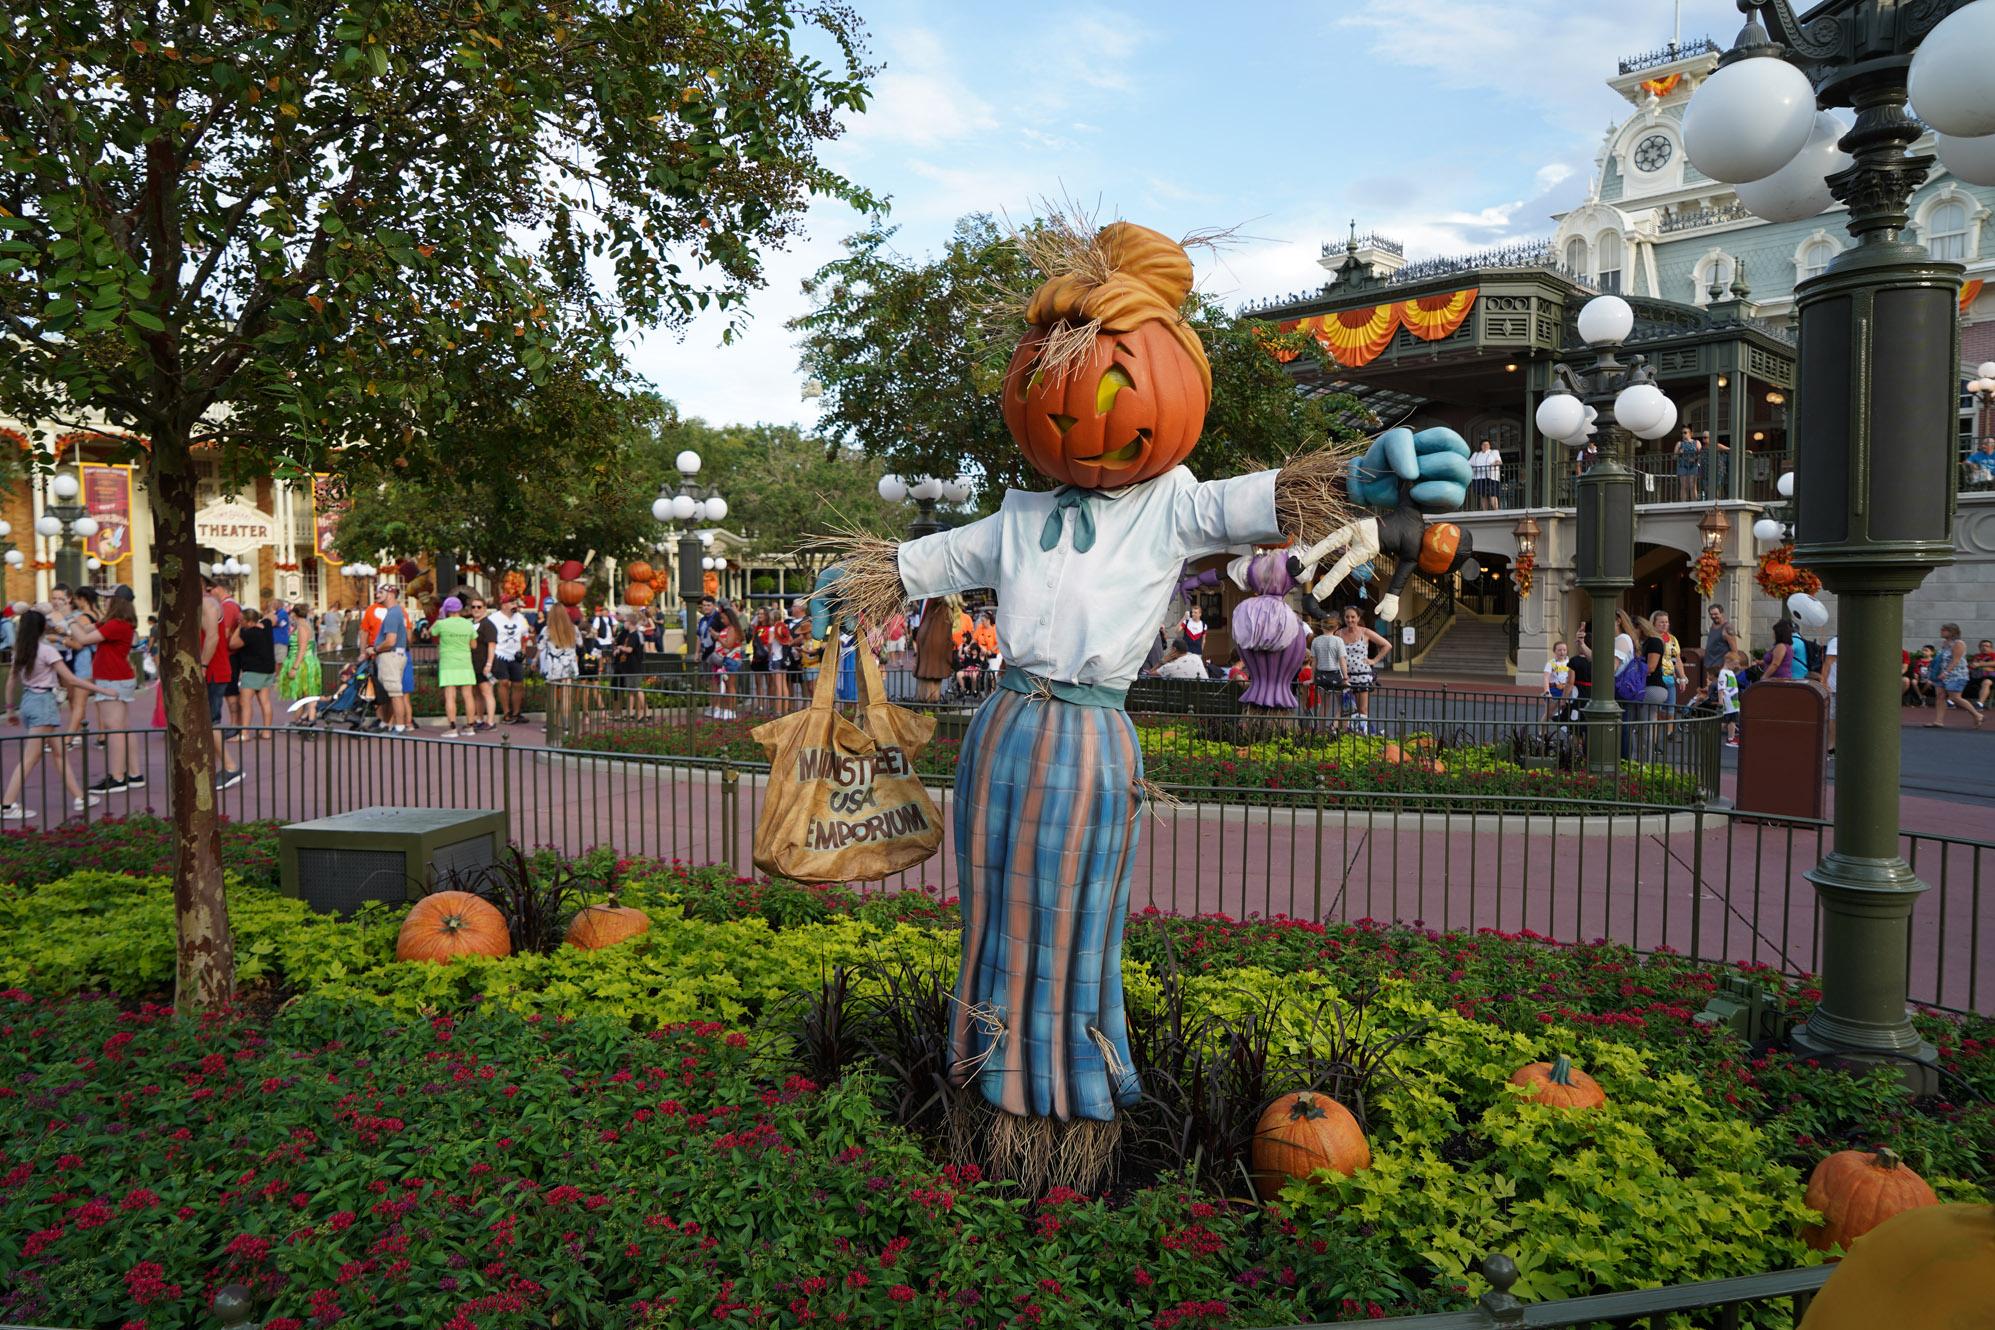 Halloween decorations at Disney World